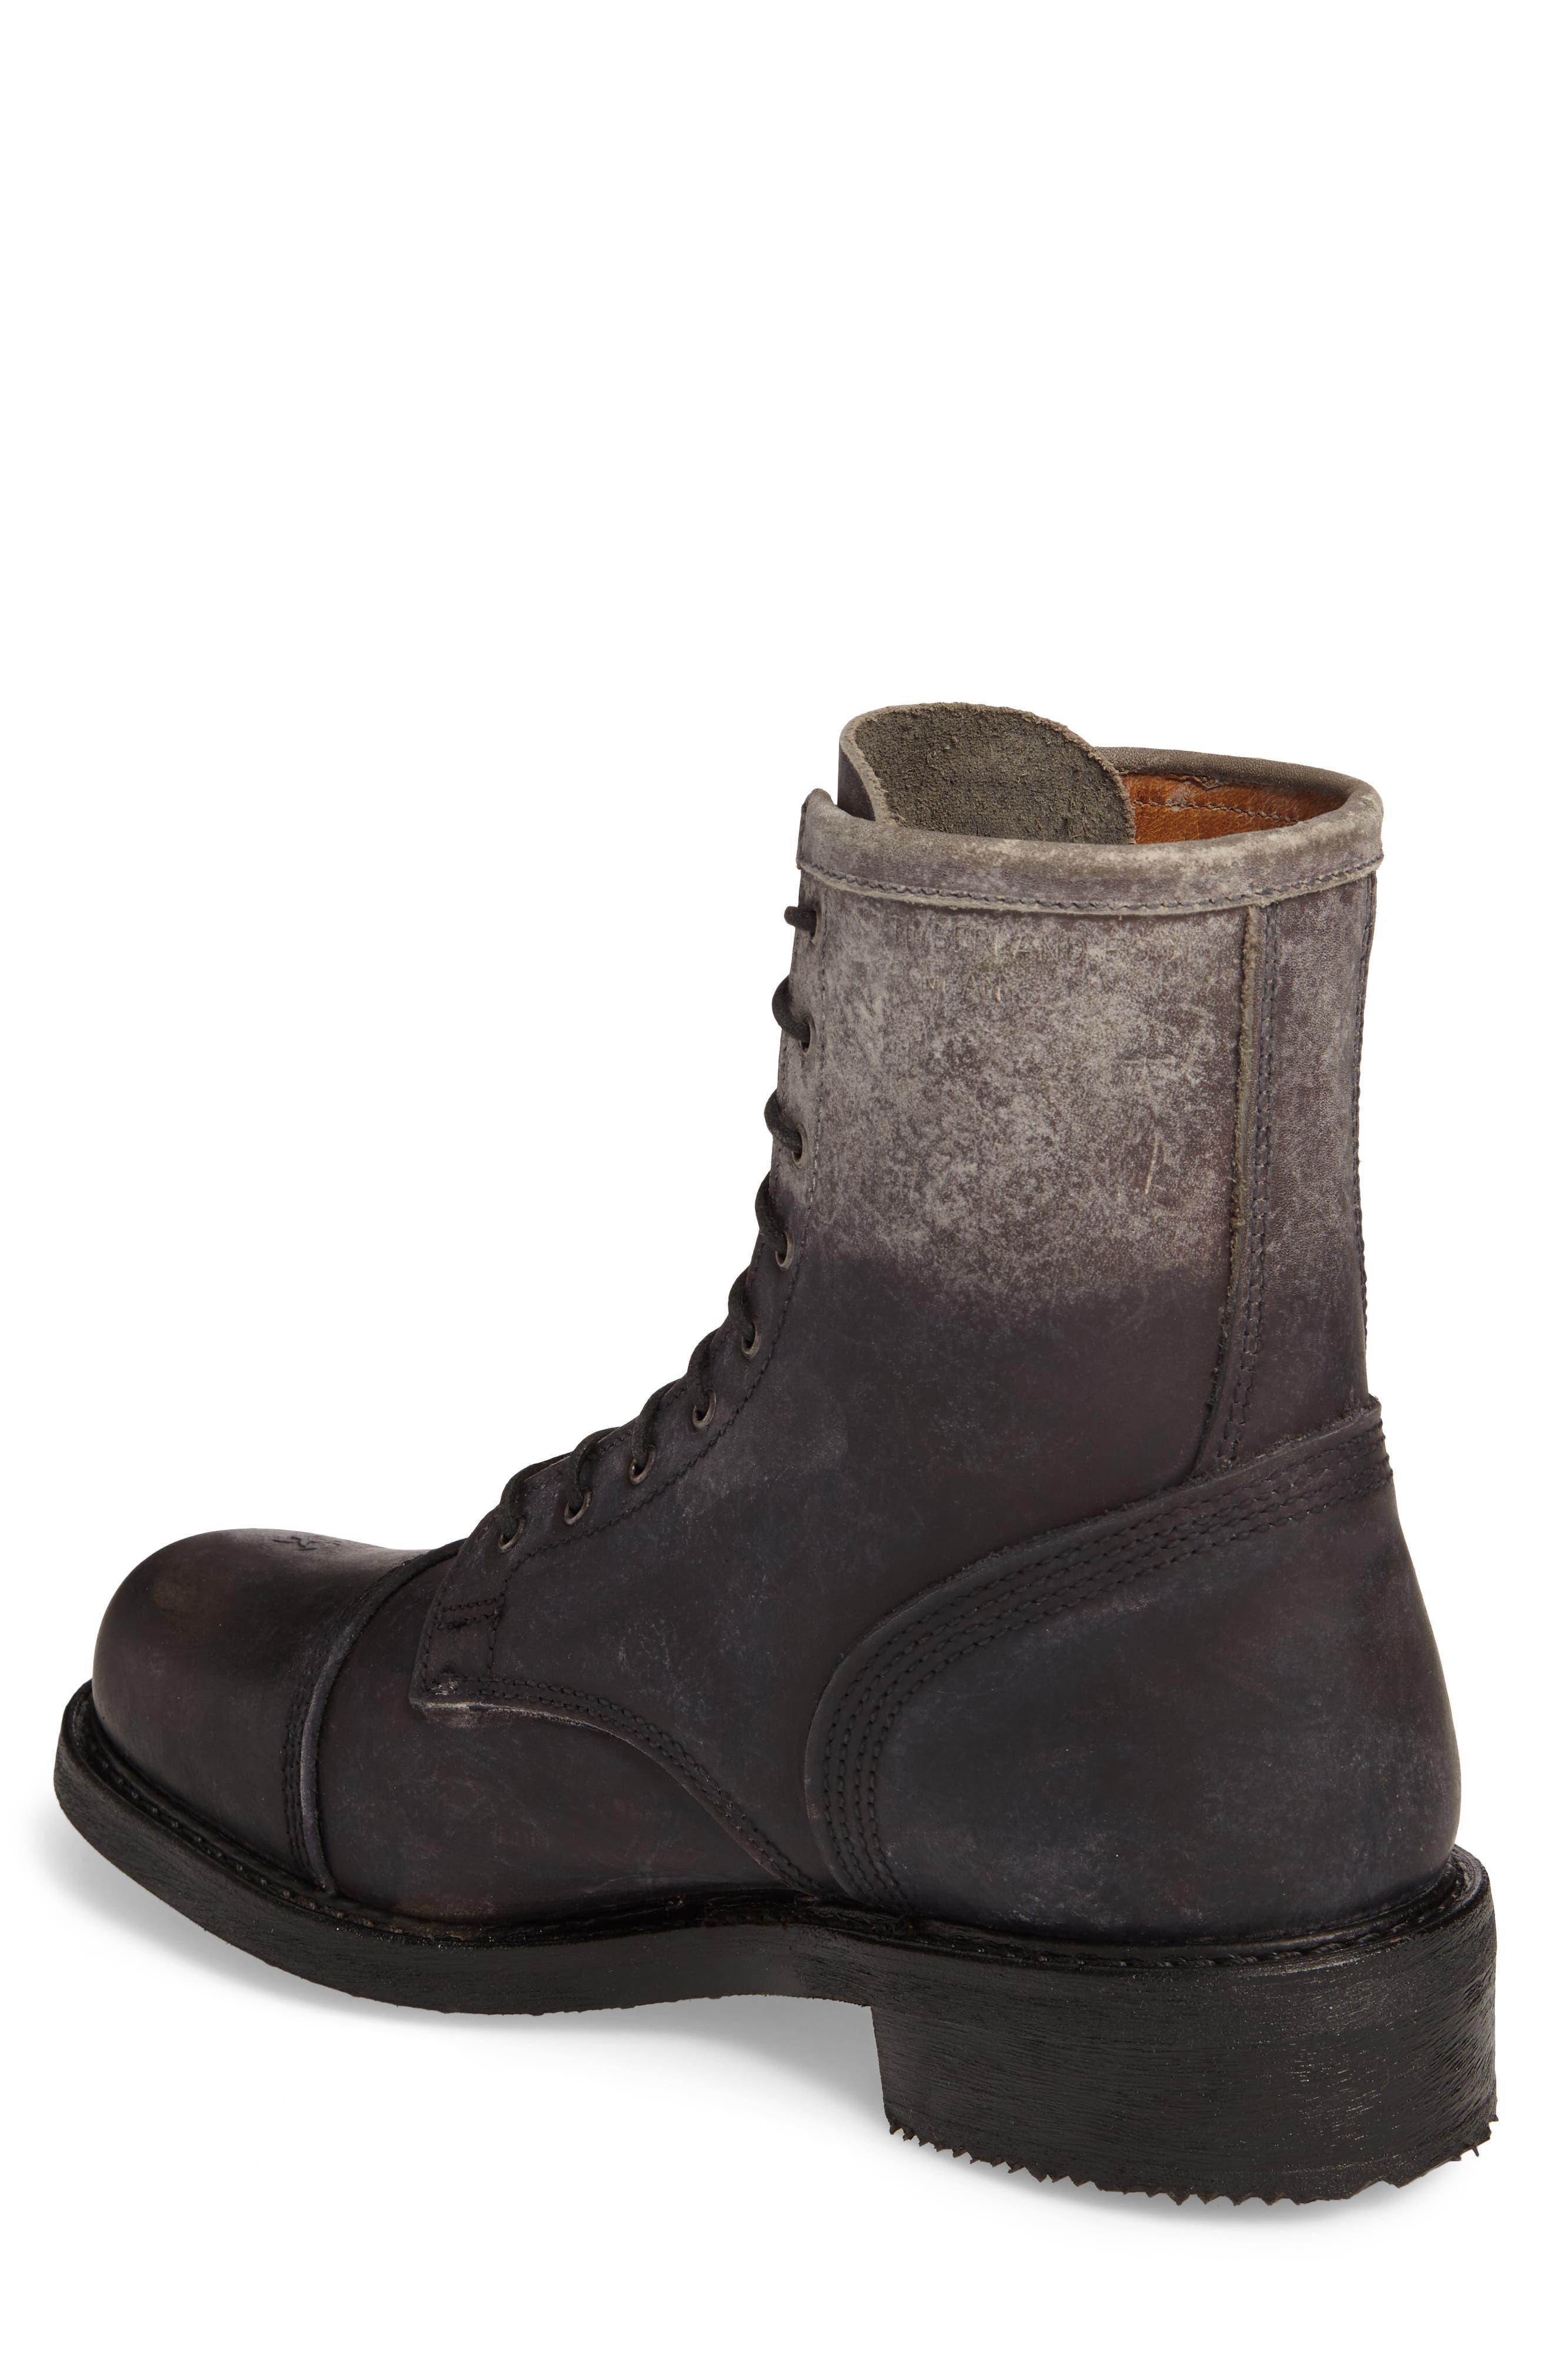 Smuggler's Notch Cap Toe Boot,                             Alternate thumbnail 2, color,                             020